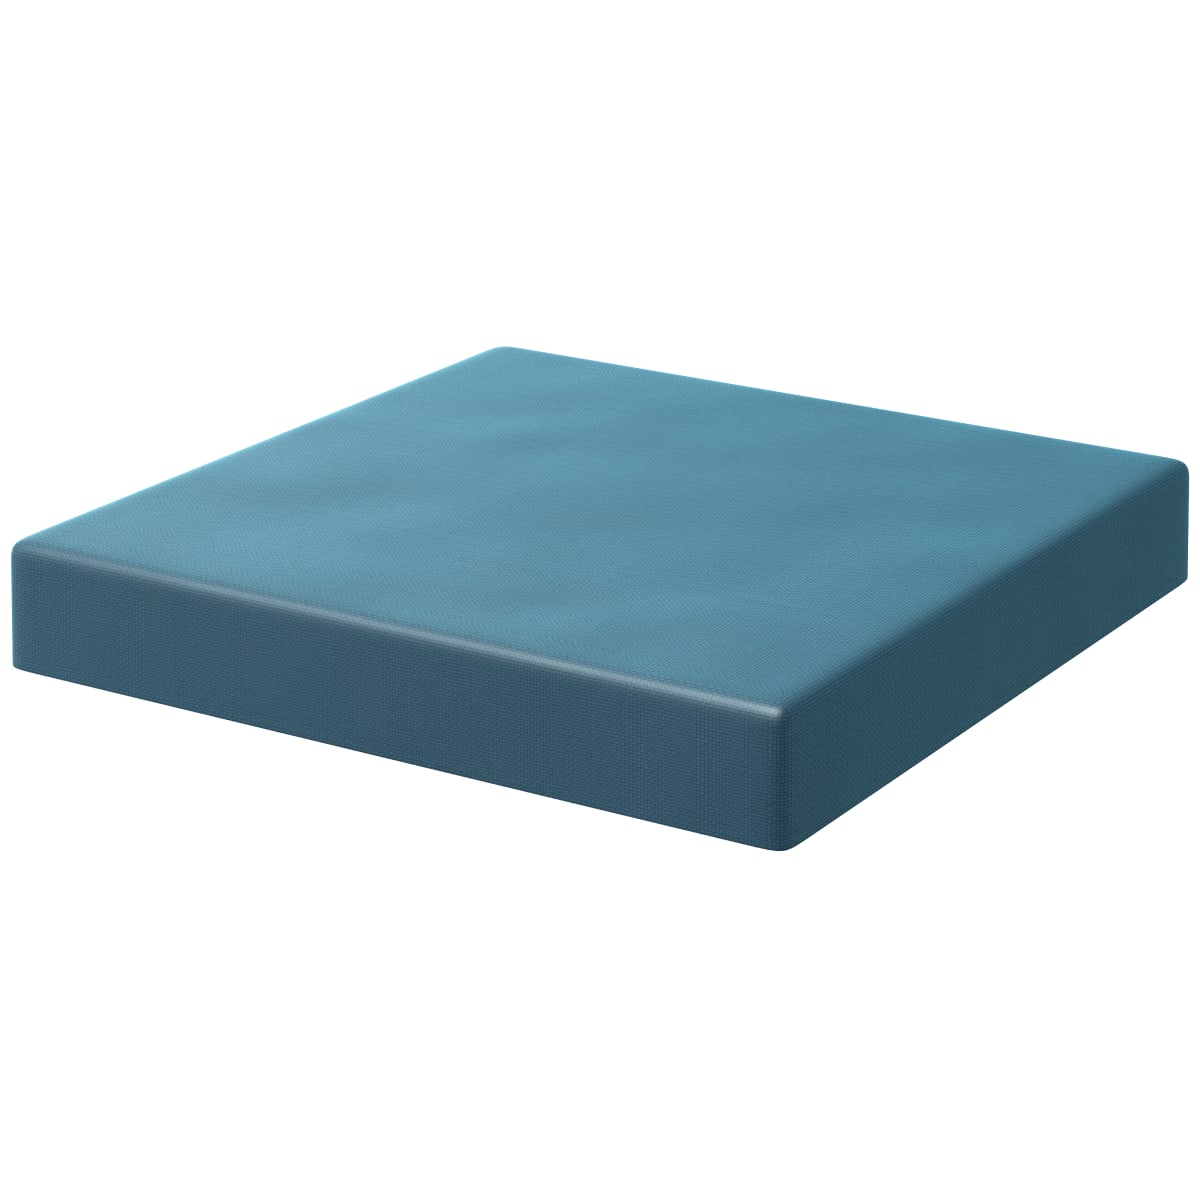 Подушка на сиденье Spaceo Kub Miami 34х38 см цвет морской волны